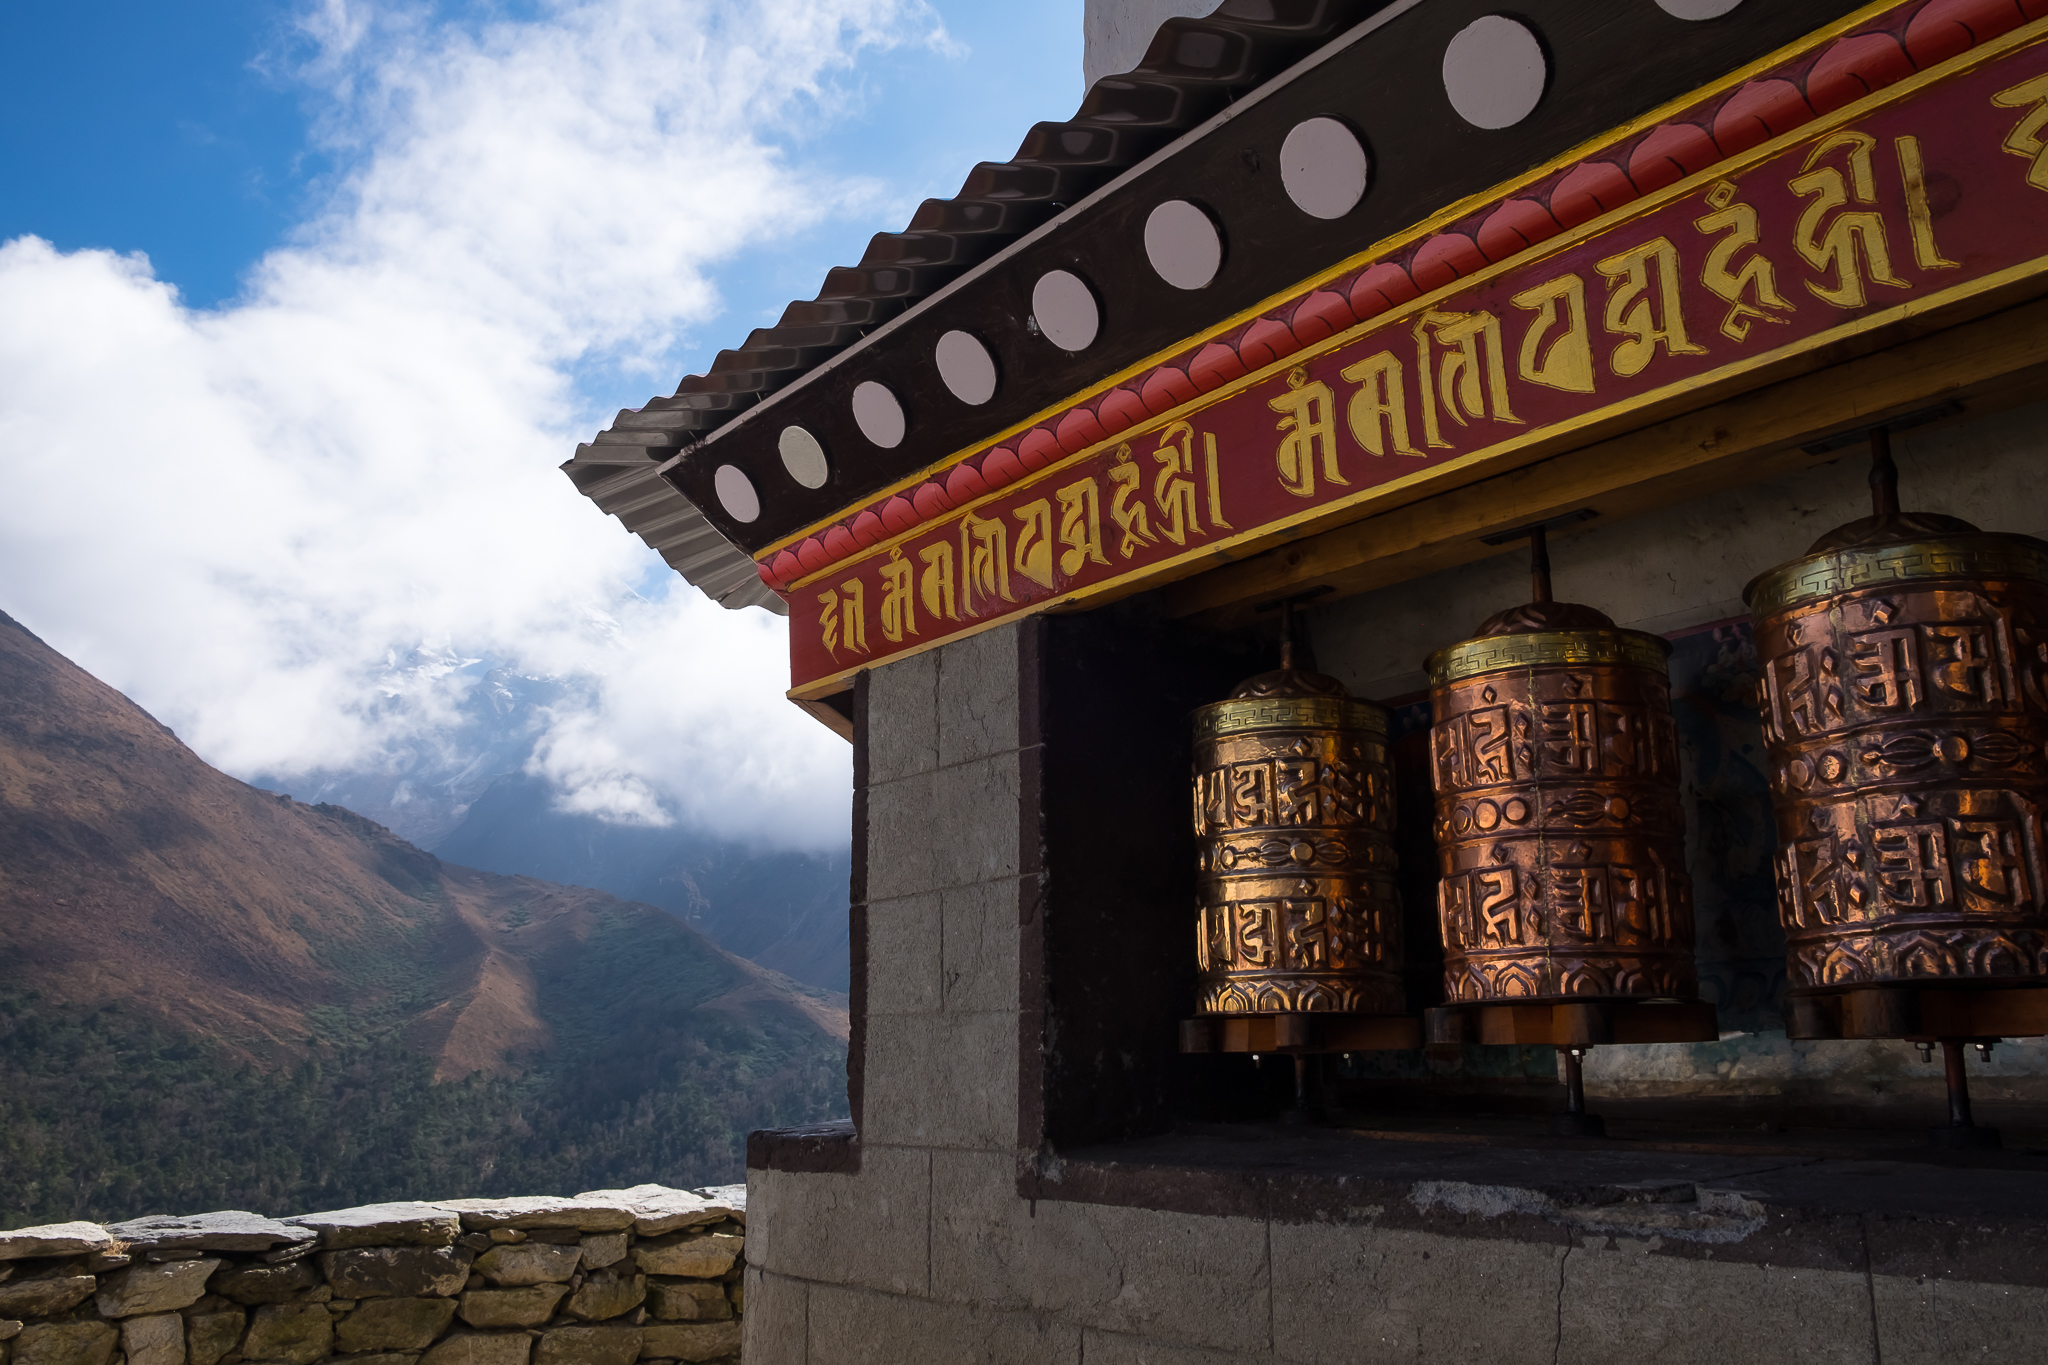 Monastery at Pangboche